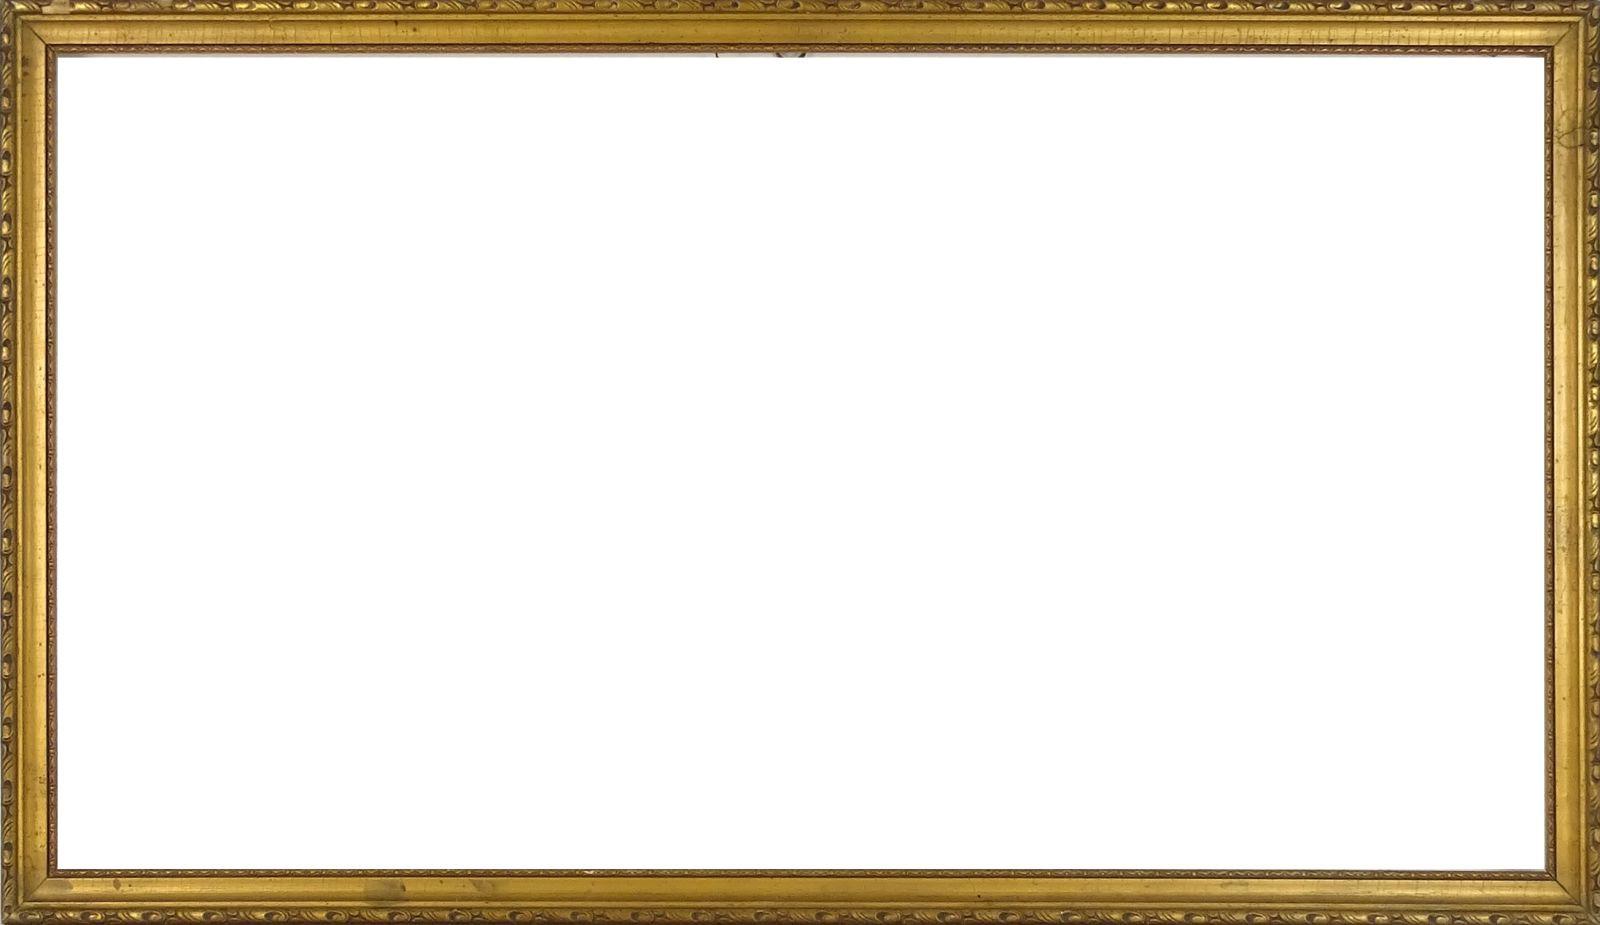 DSC02546.JPG (1600×925)